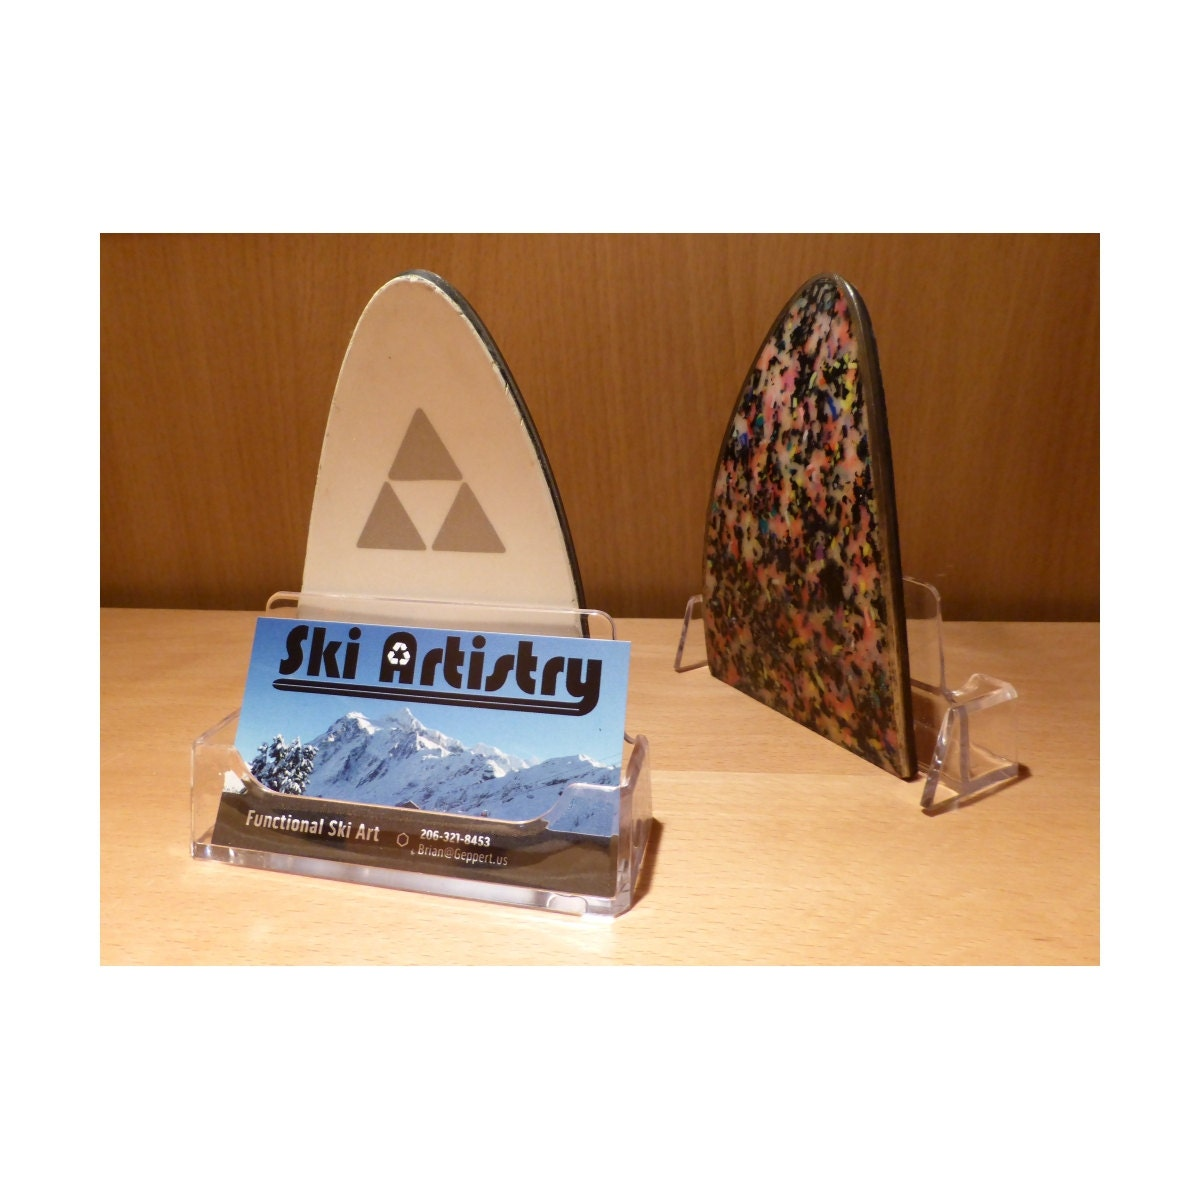 ski tip business card holder by skiartistry on etsy